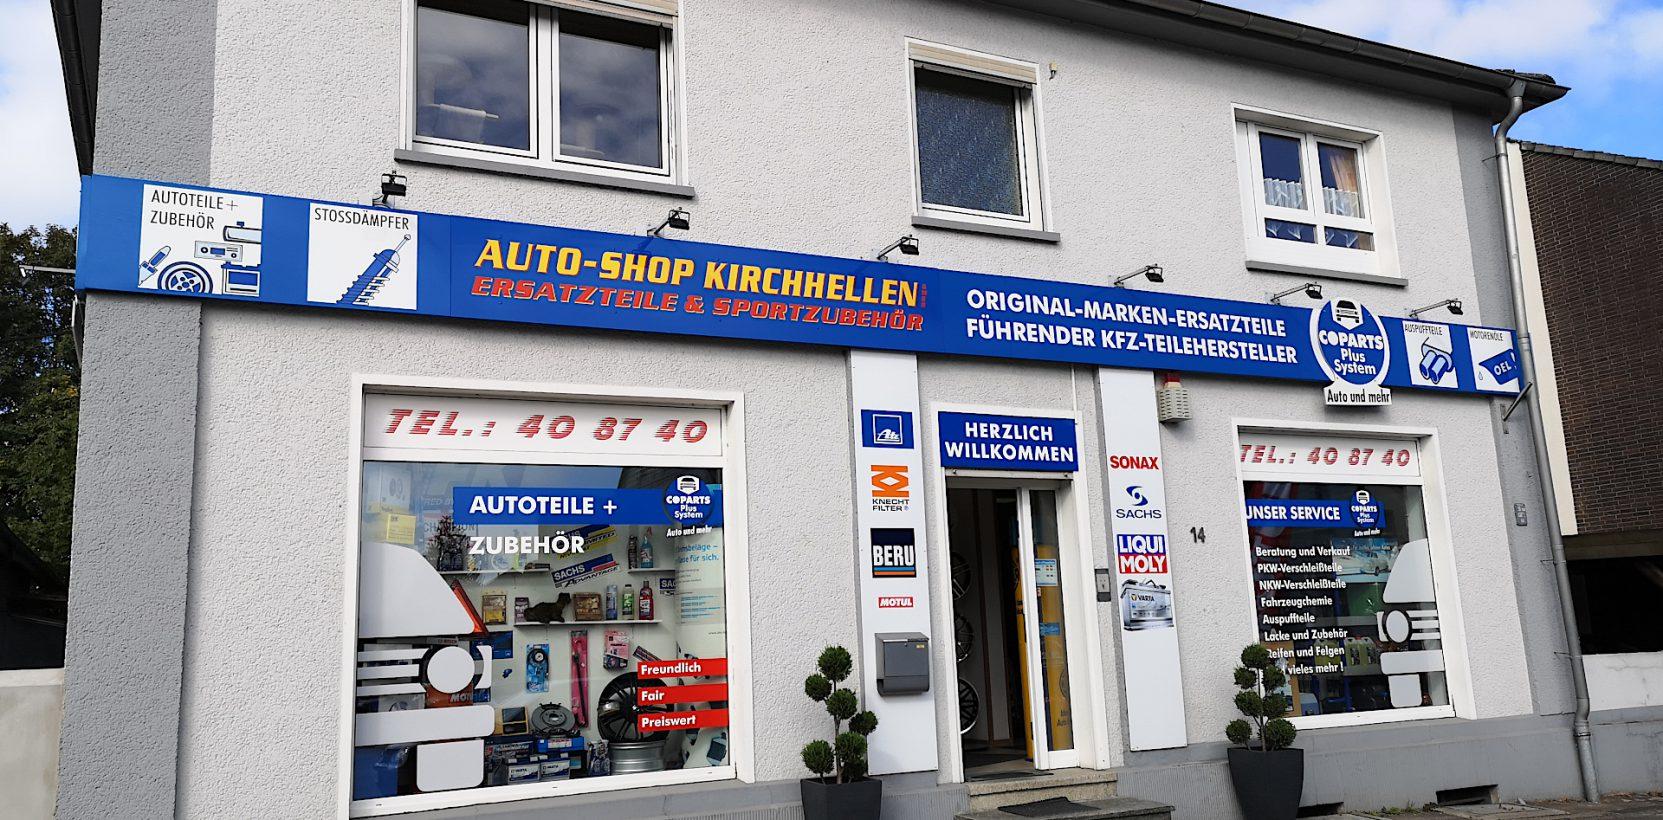 Auto-Shop Kirchhellen